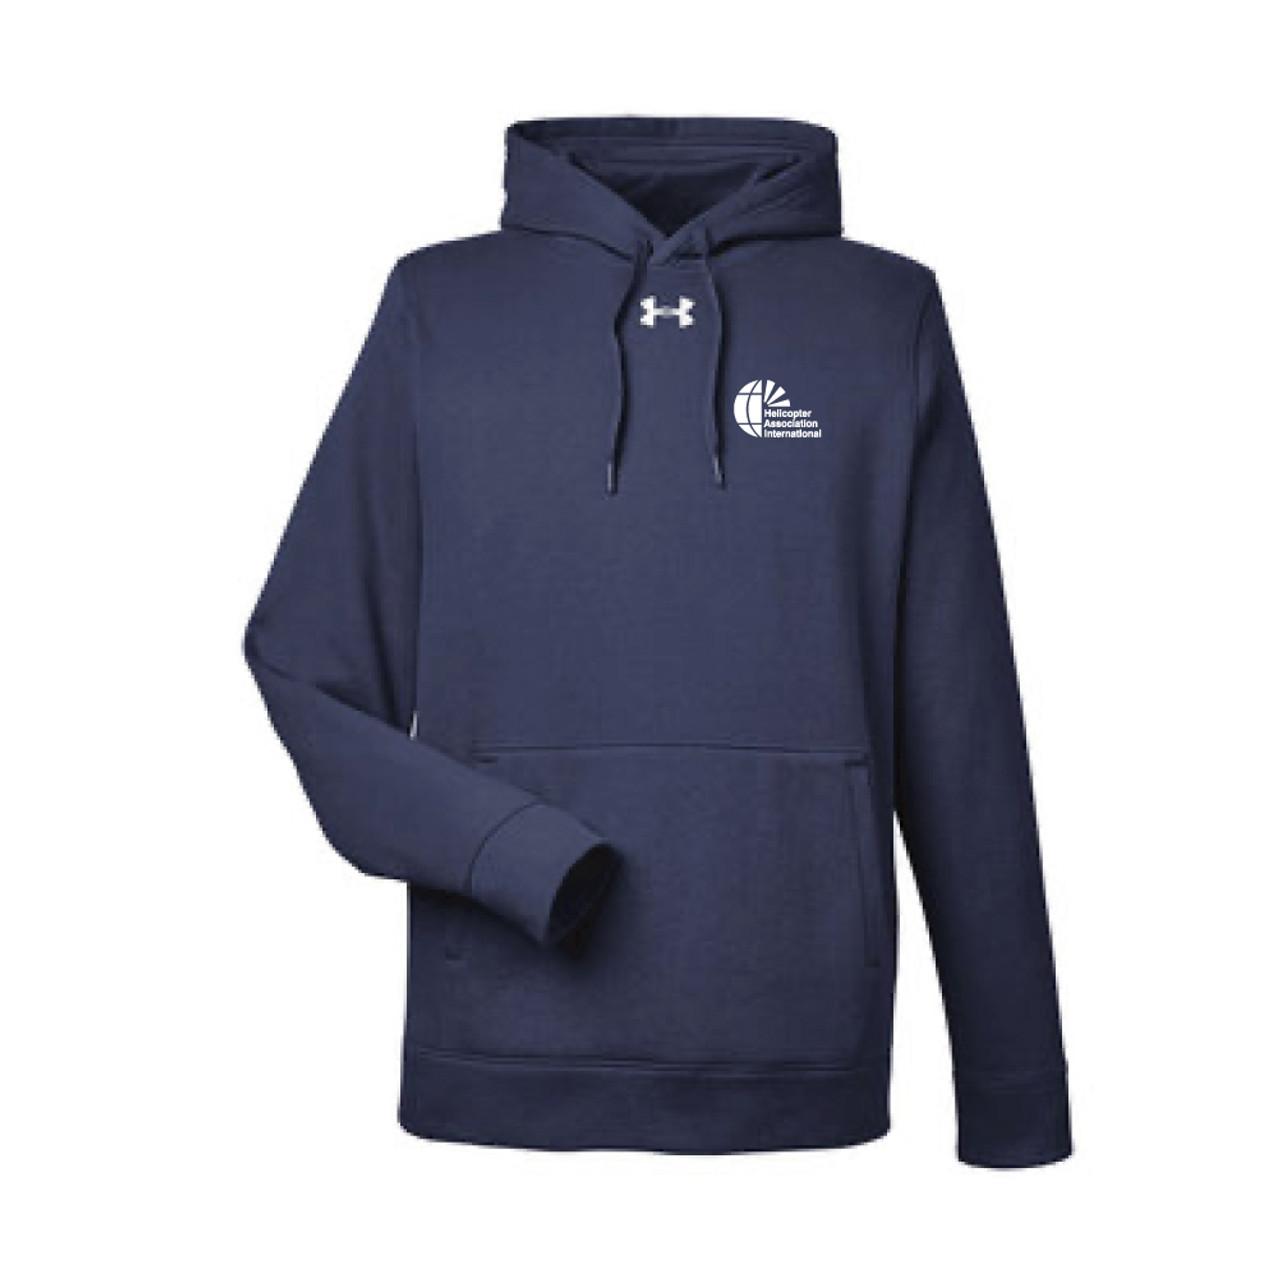 Mens Under Armour Navy Pullover Hood Sweatshirt